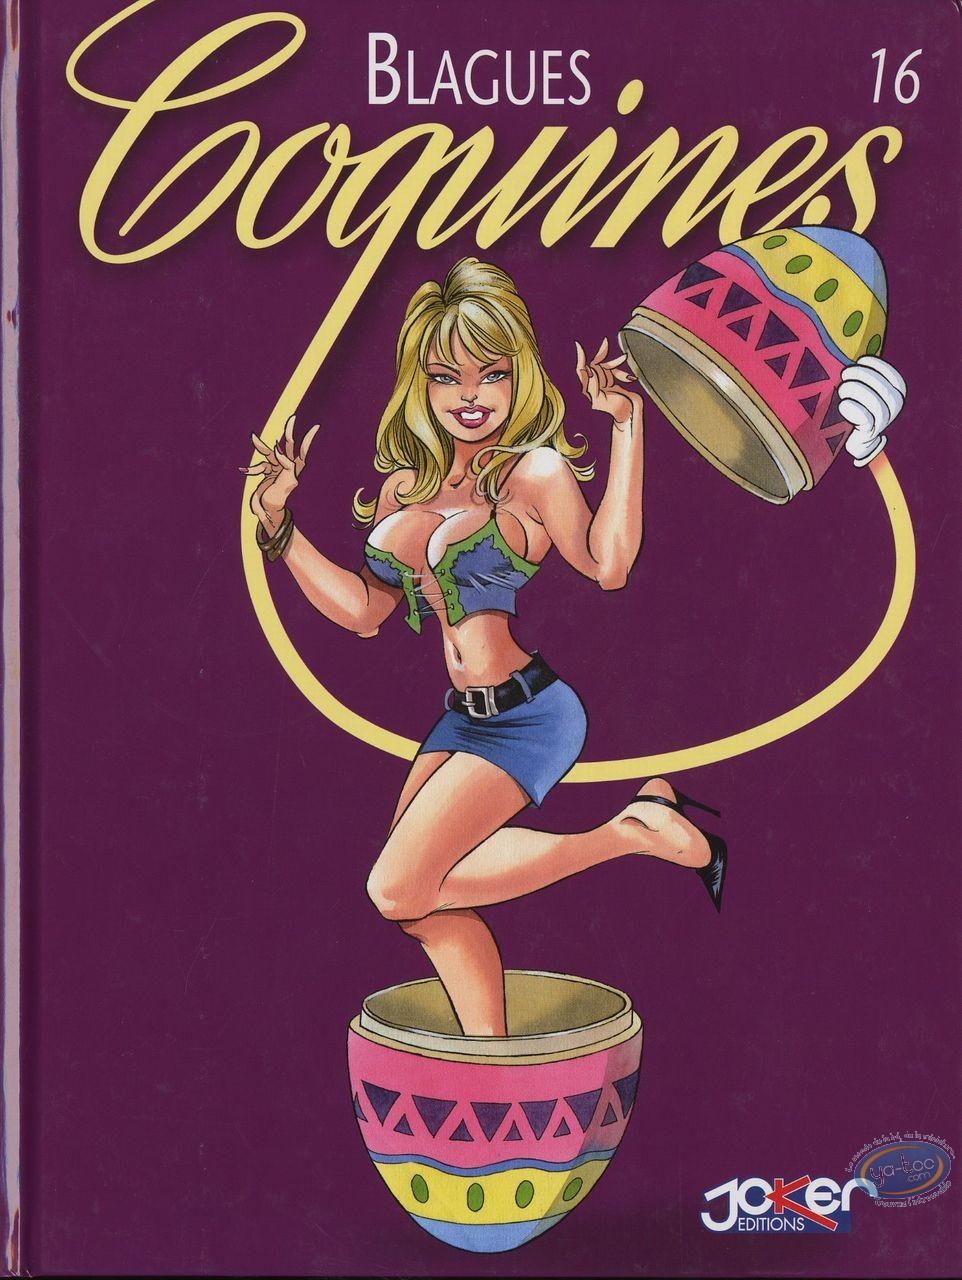 Adult European Comic Books, Blagues Coquines : Blagues Coquines, Vol 16